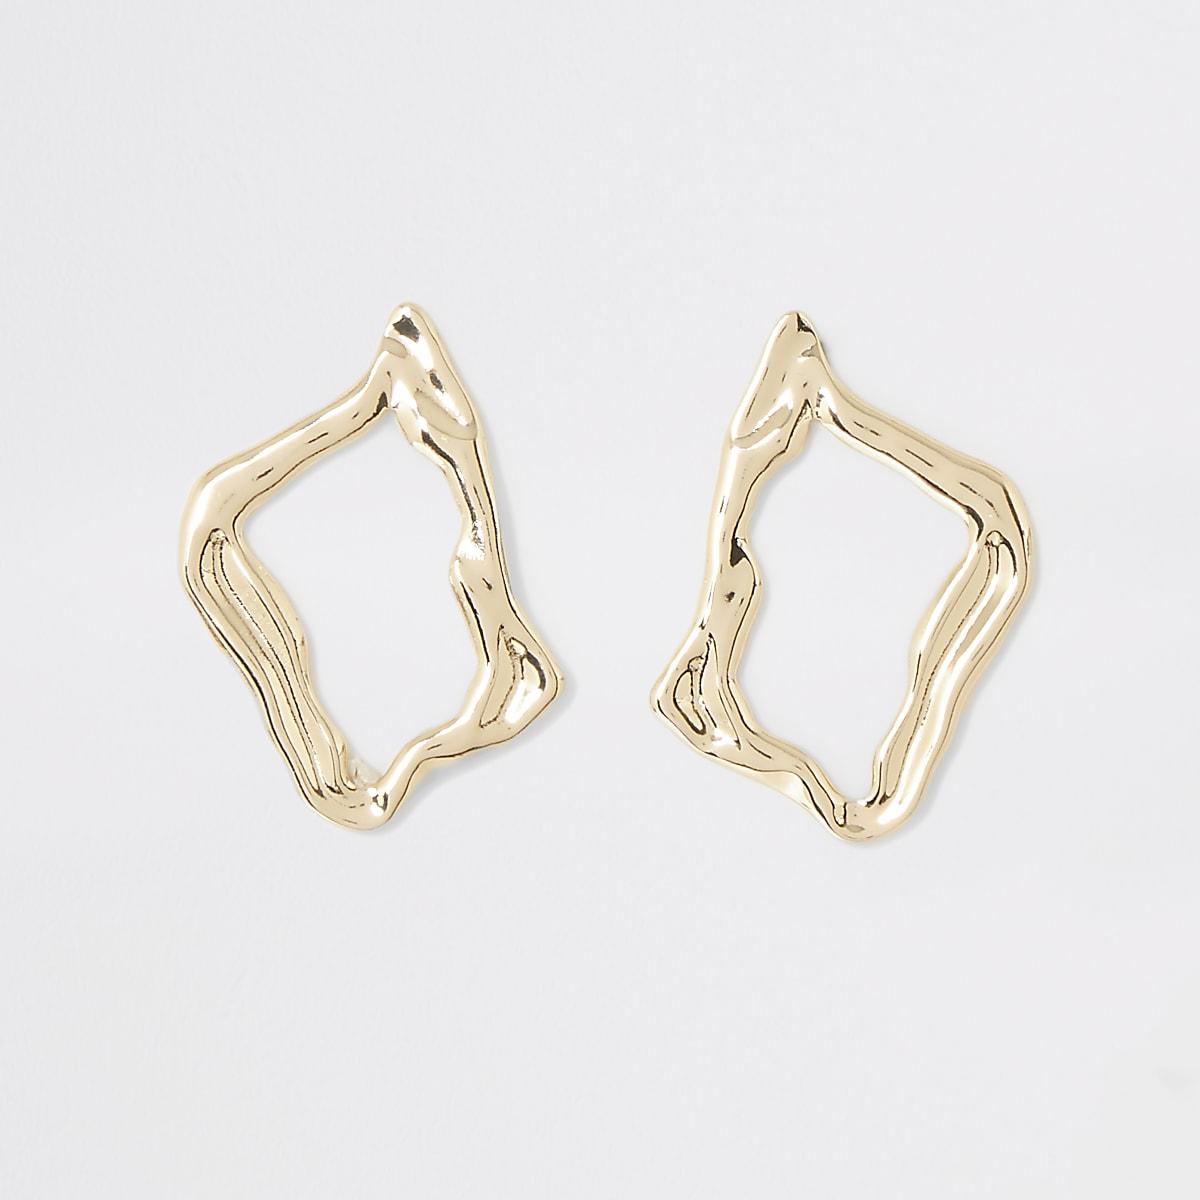 Gold color wavy stud earrings